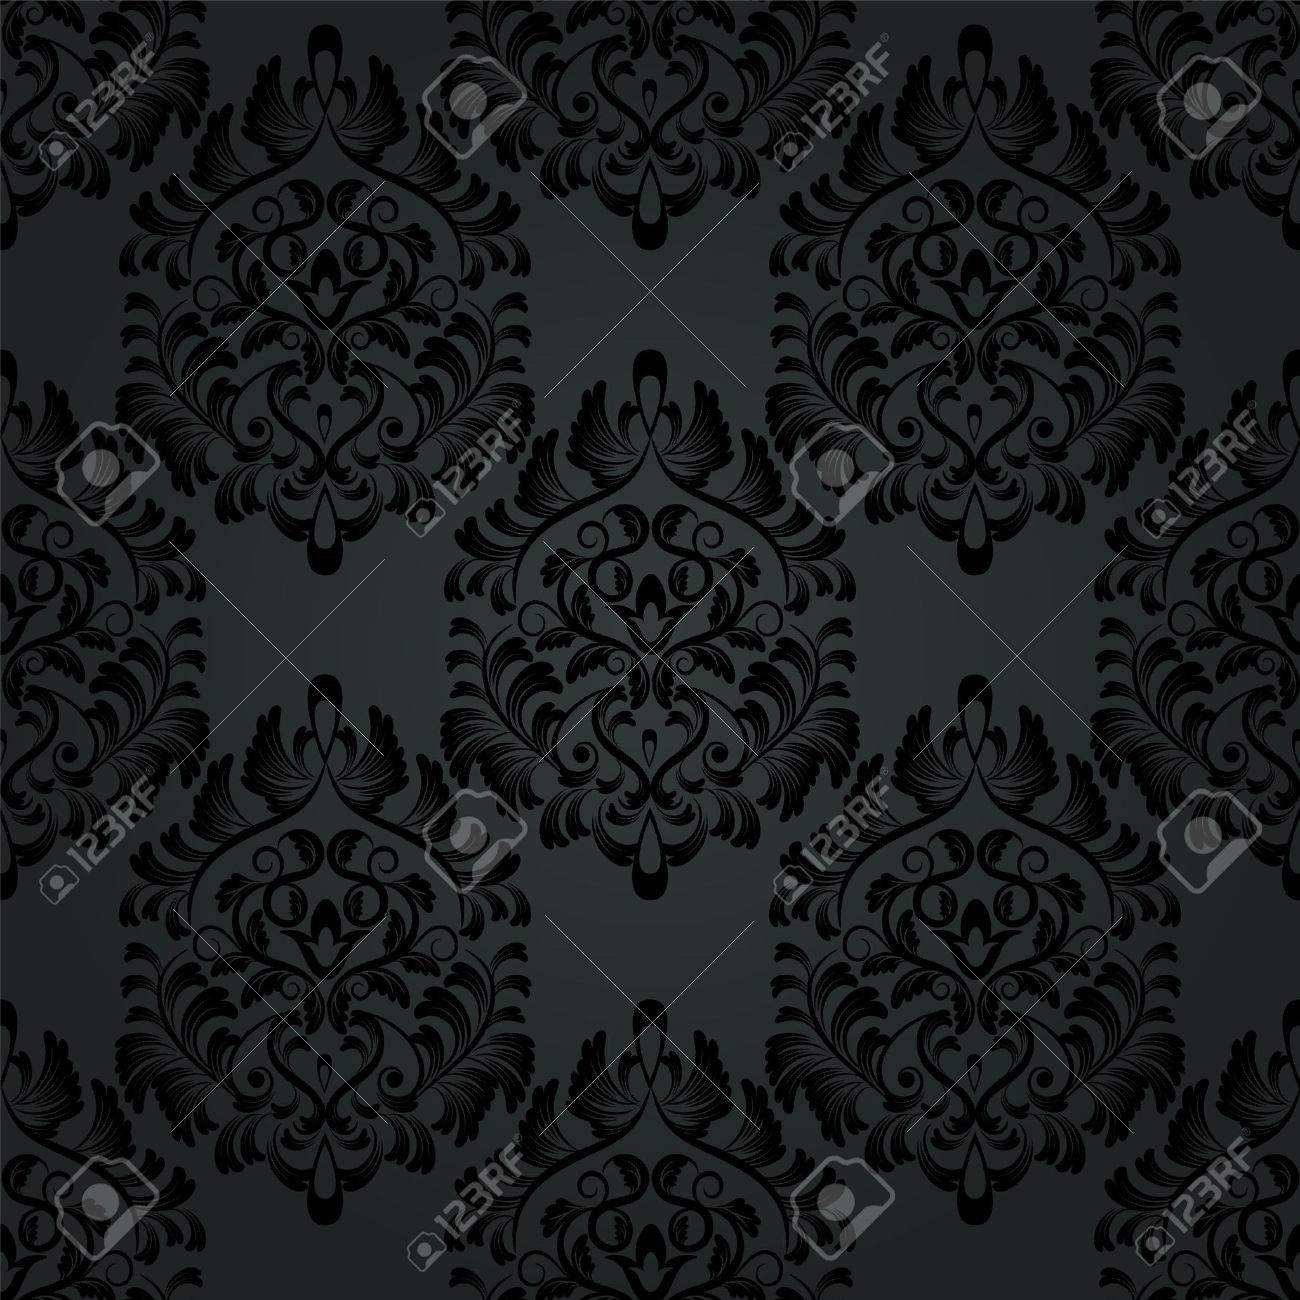 Luxury Seamless Charcoal Gothic Pattern Dark Wallpaper Royalty Free